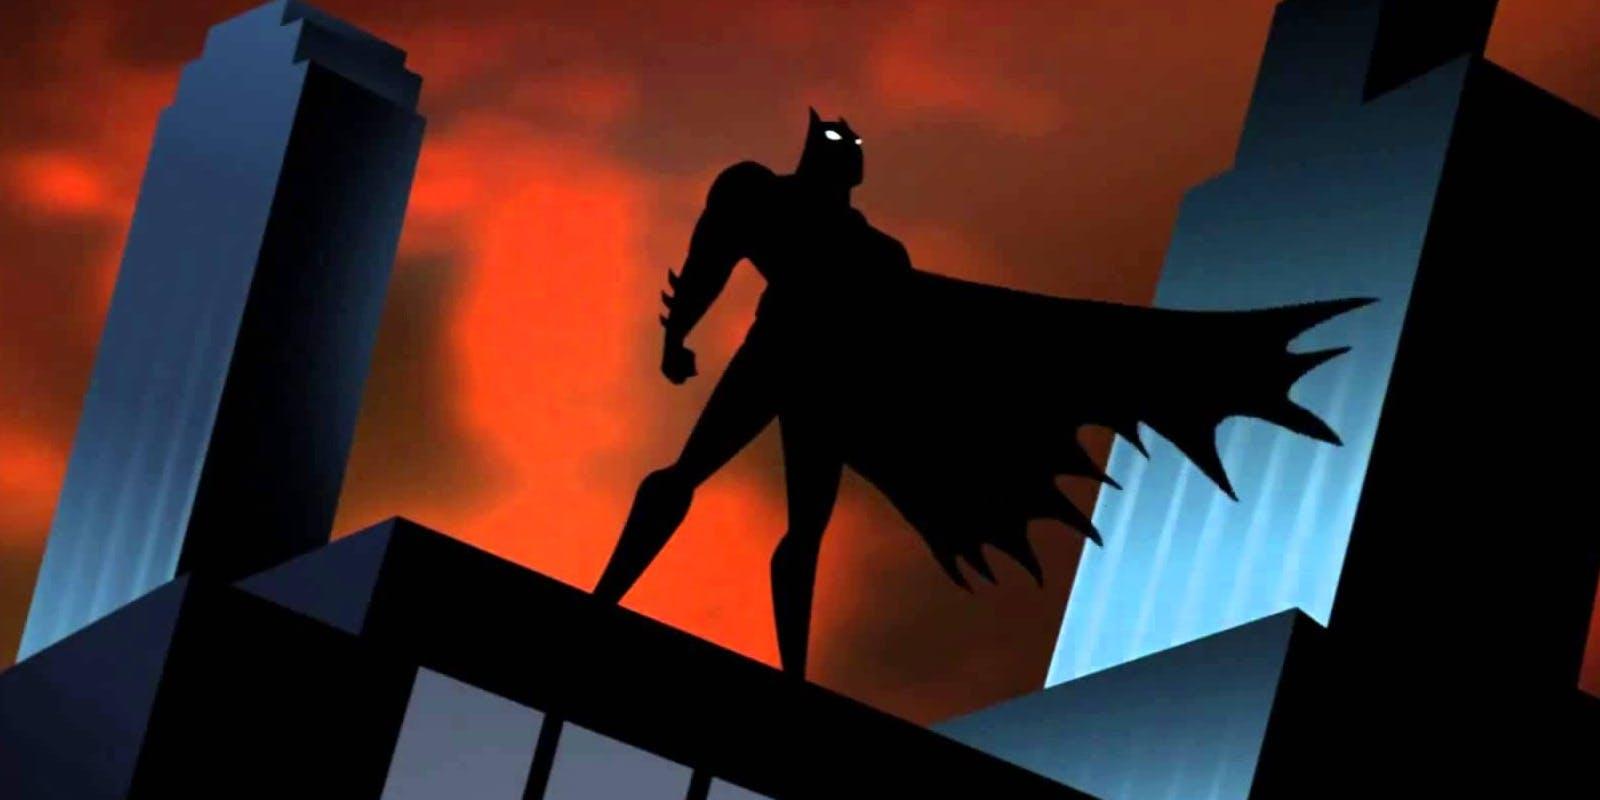 batman-the-animated-series-header.jpg